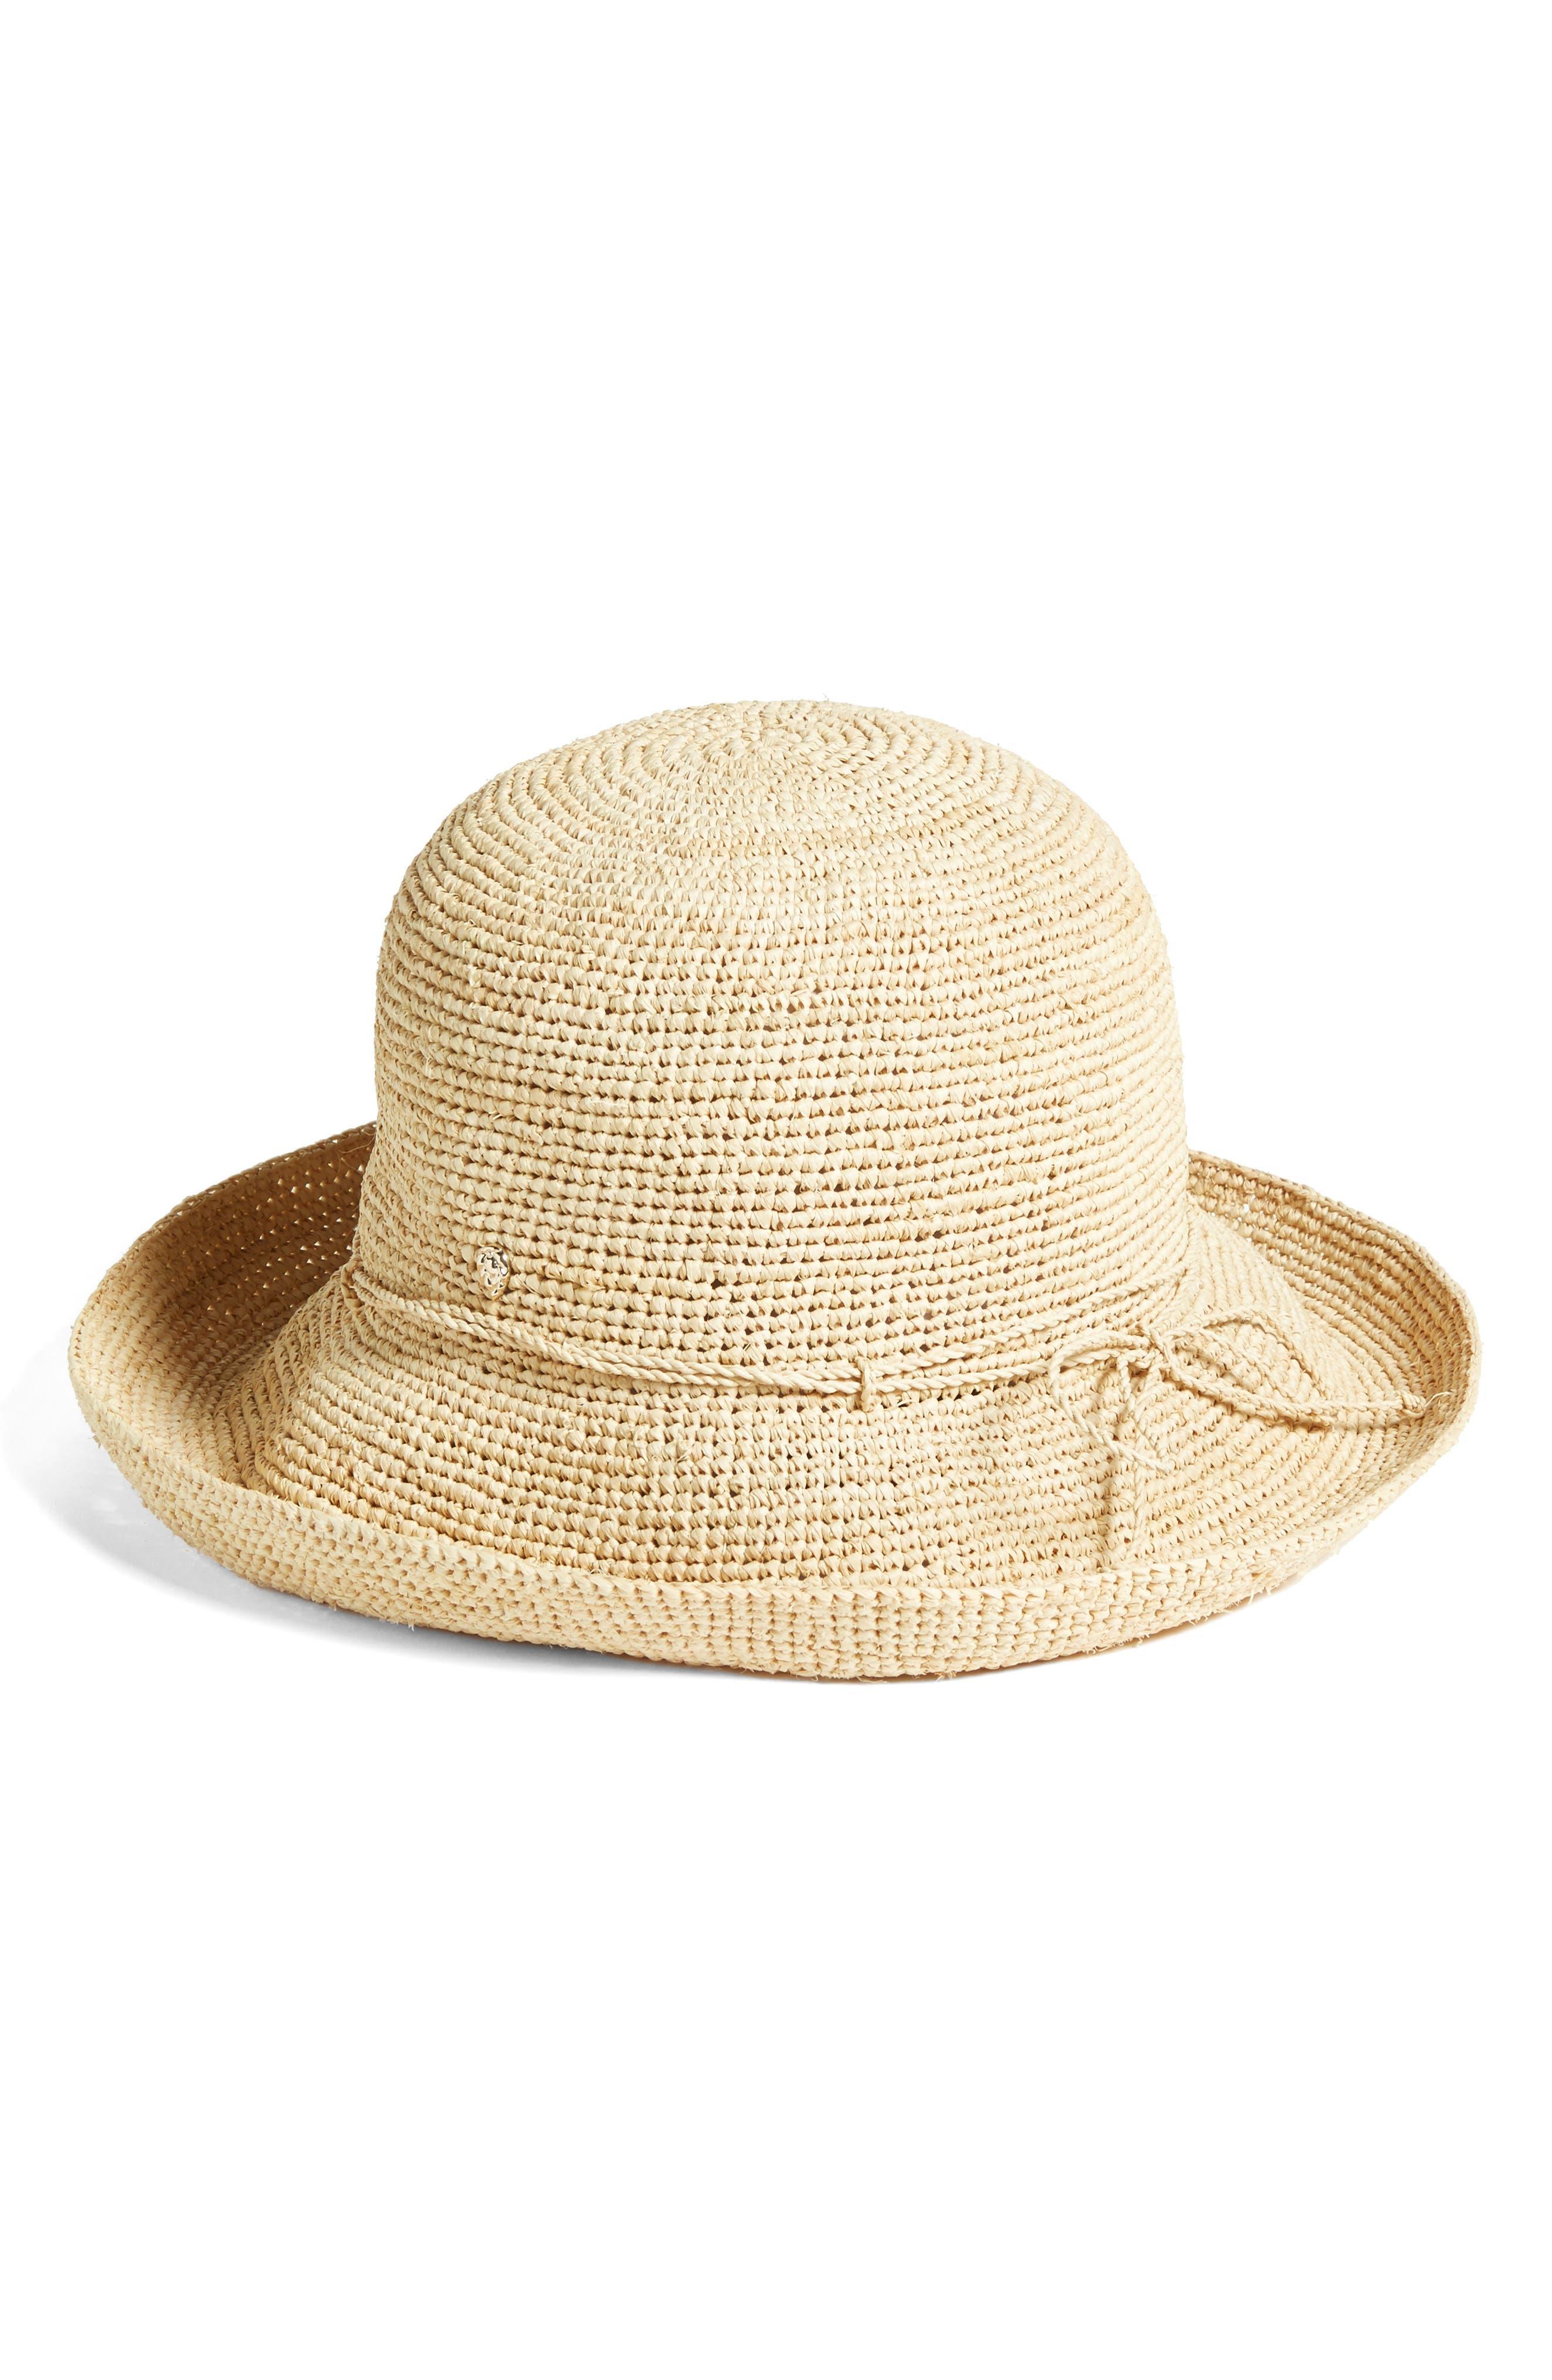 Alternate Image 2  - Helen Kaminski '9 Villa' Raffia Straw Hat